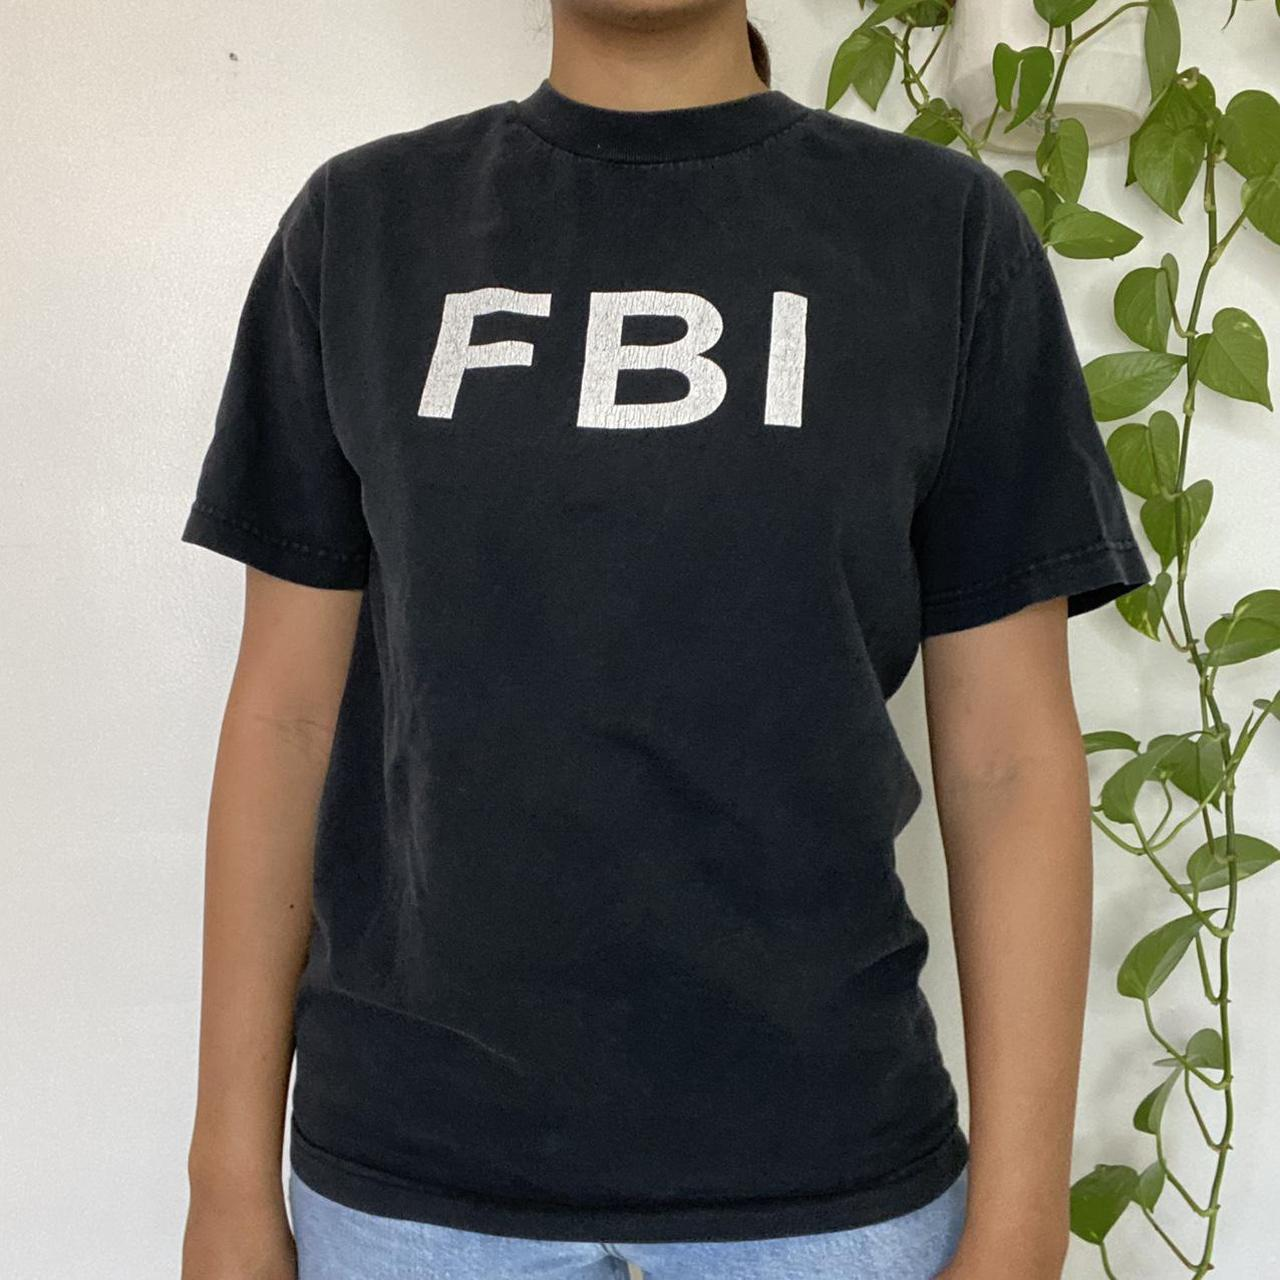 Product Image 1 - FBI t-shirt 🖤  Black t-shirt with